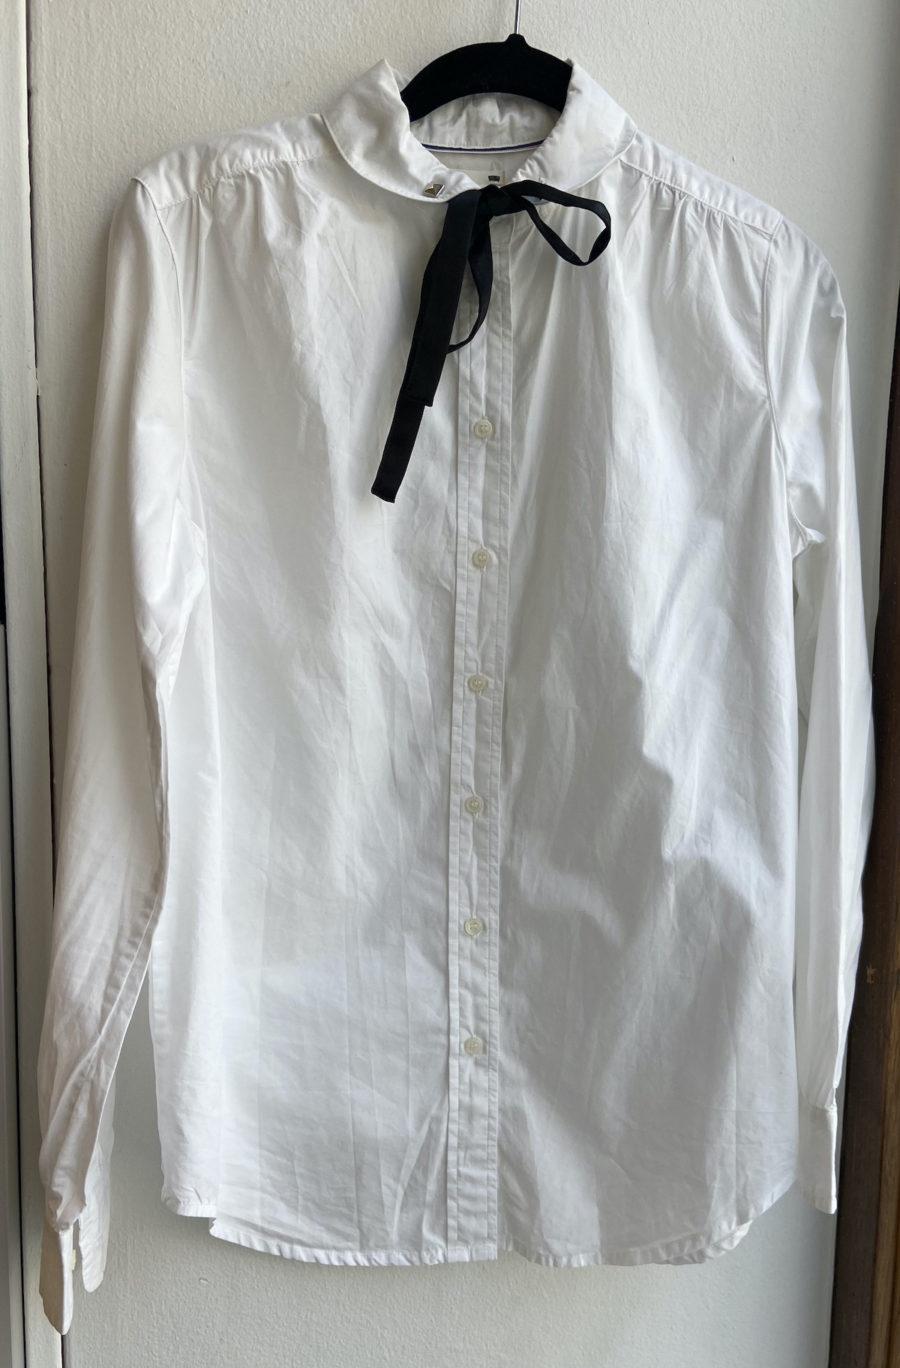 Ecosphere Vintage - White Levi's Shirt